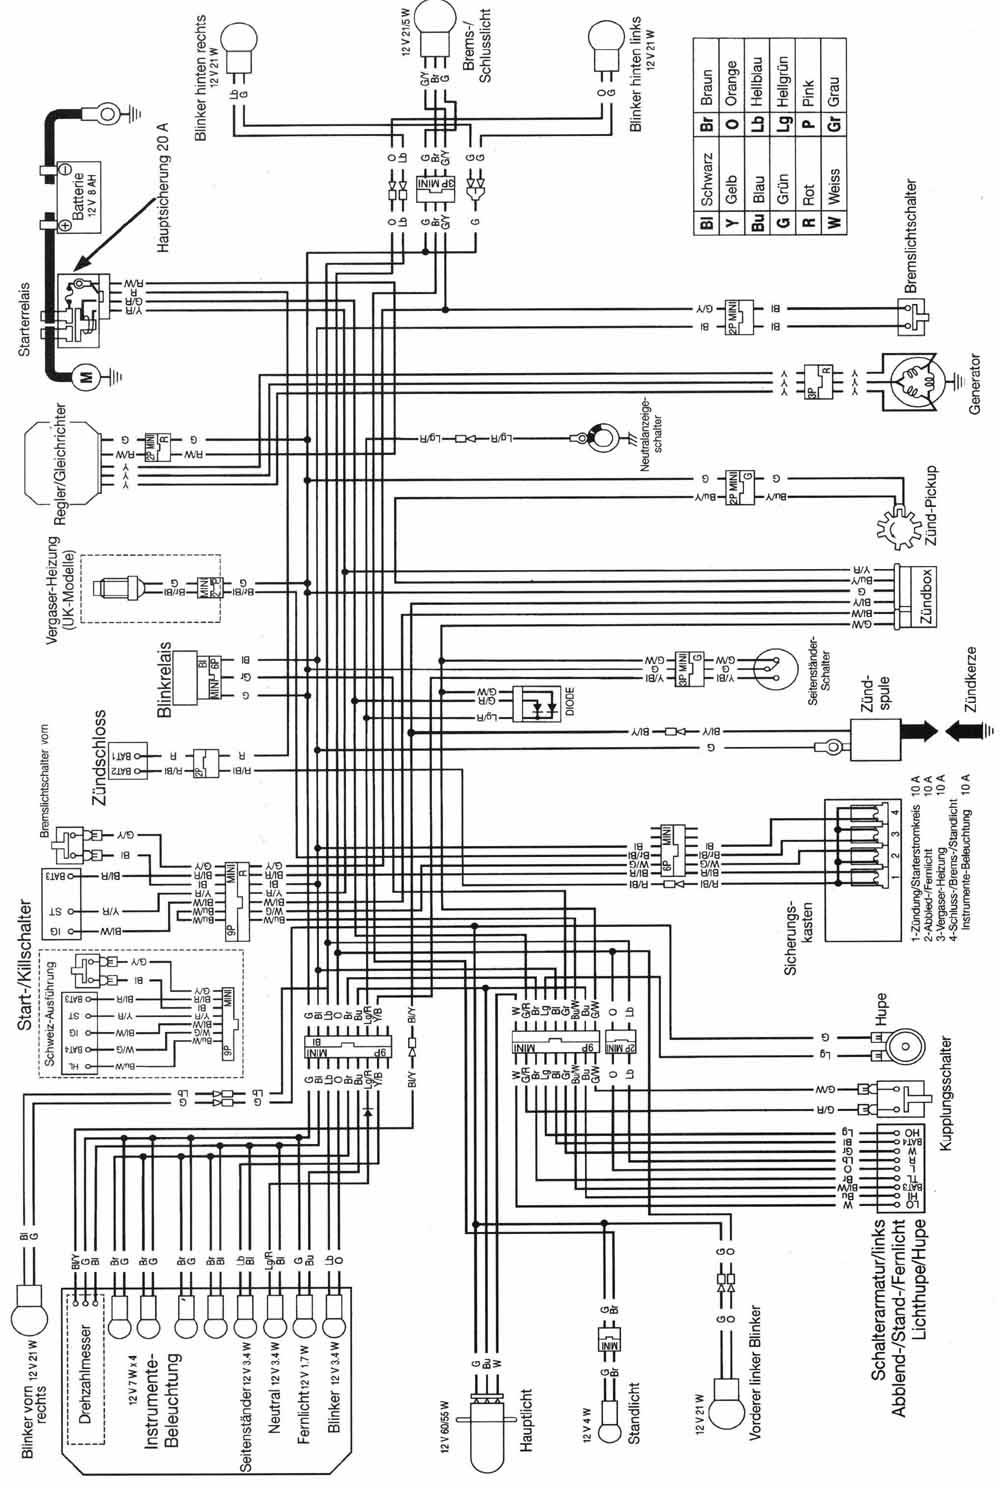 Nx650 Wiring Diagram Diagrams Honda Nx 650 Electrical Smart Car Dominator Simple